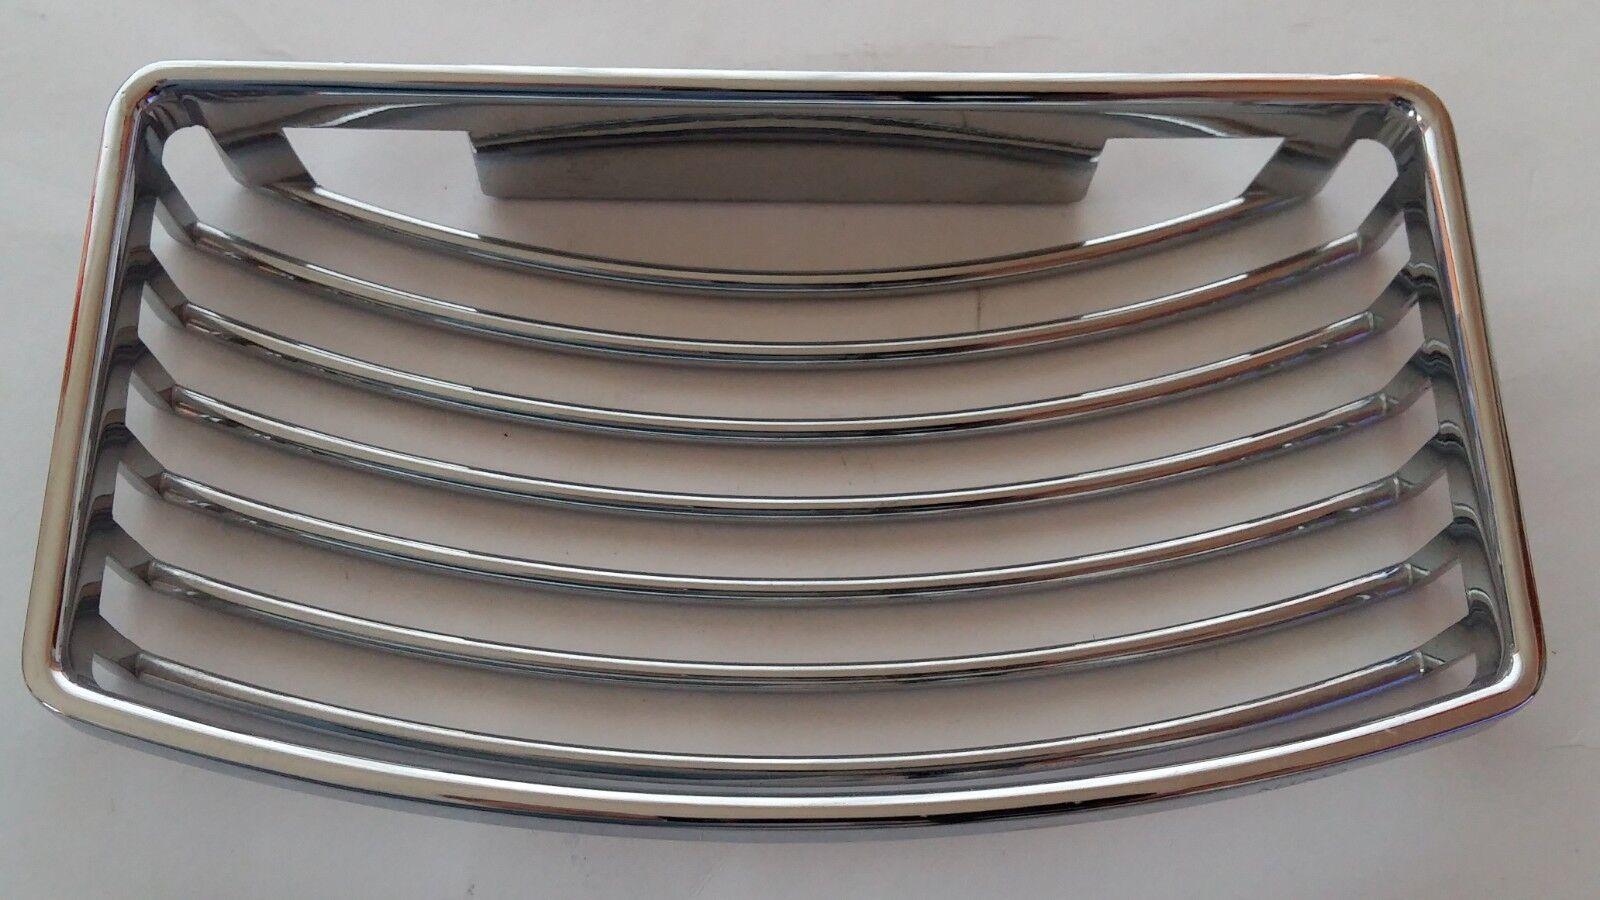 Keuco Schwammkorb Universal 200 x 114 x 28 mm 24942010000     | Trendy